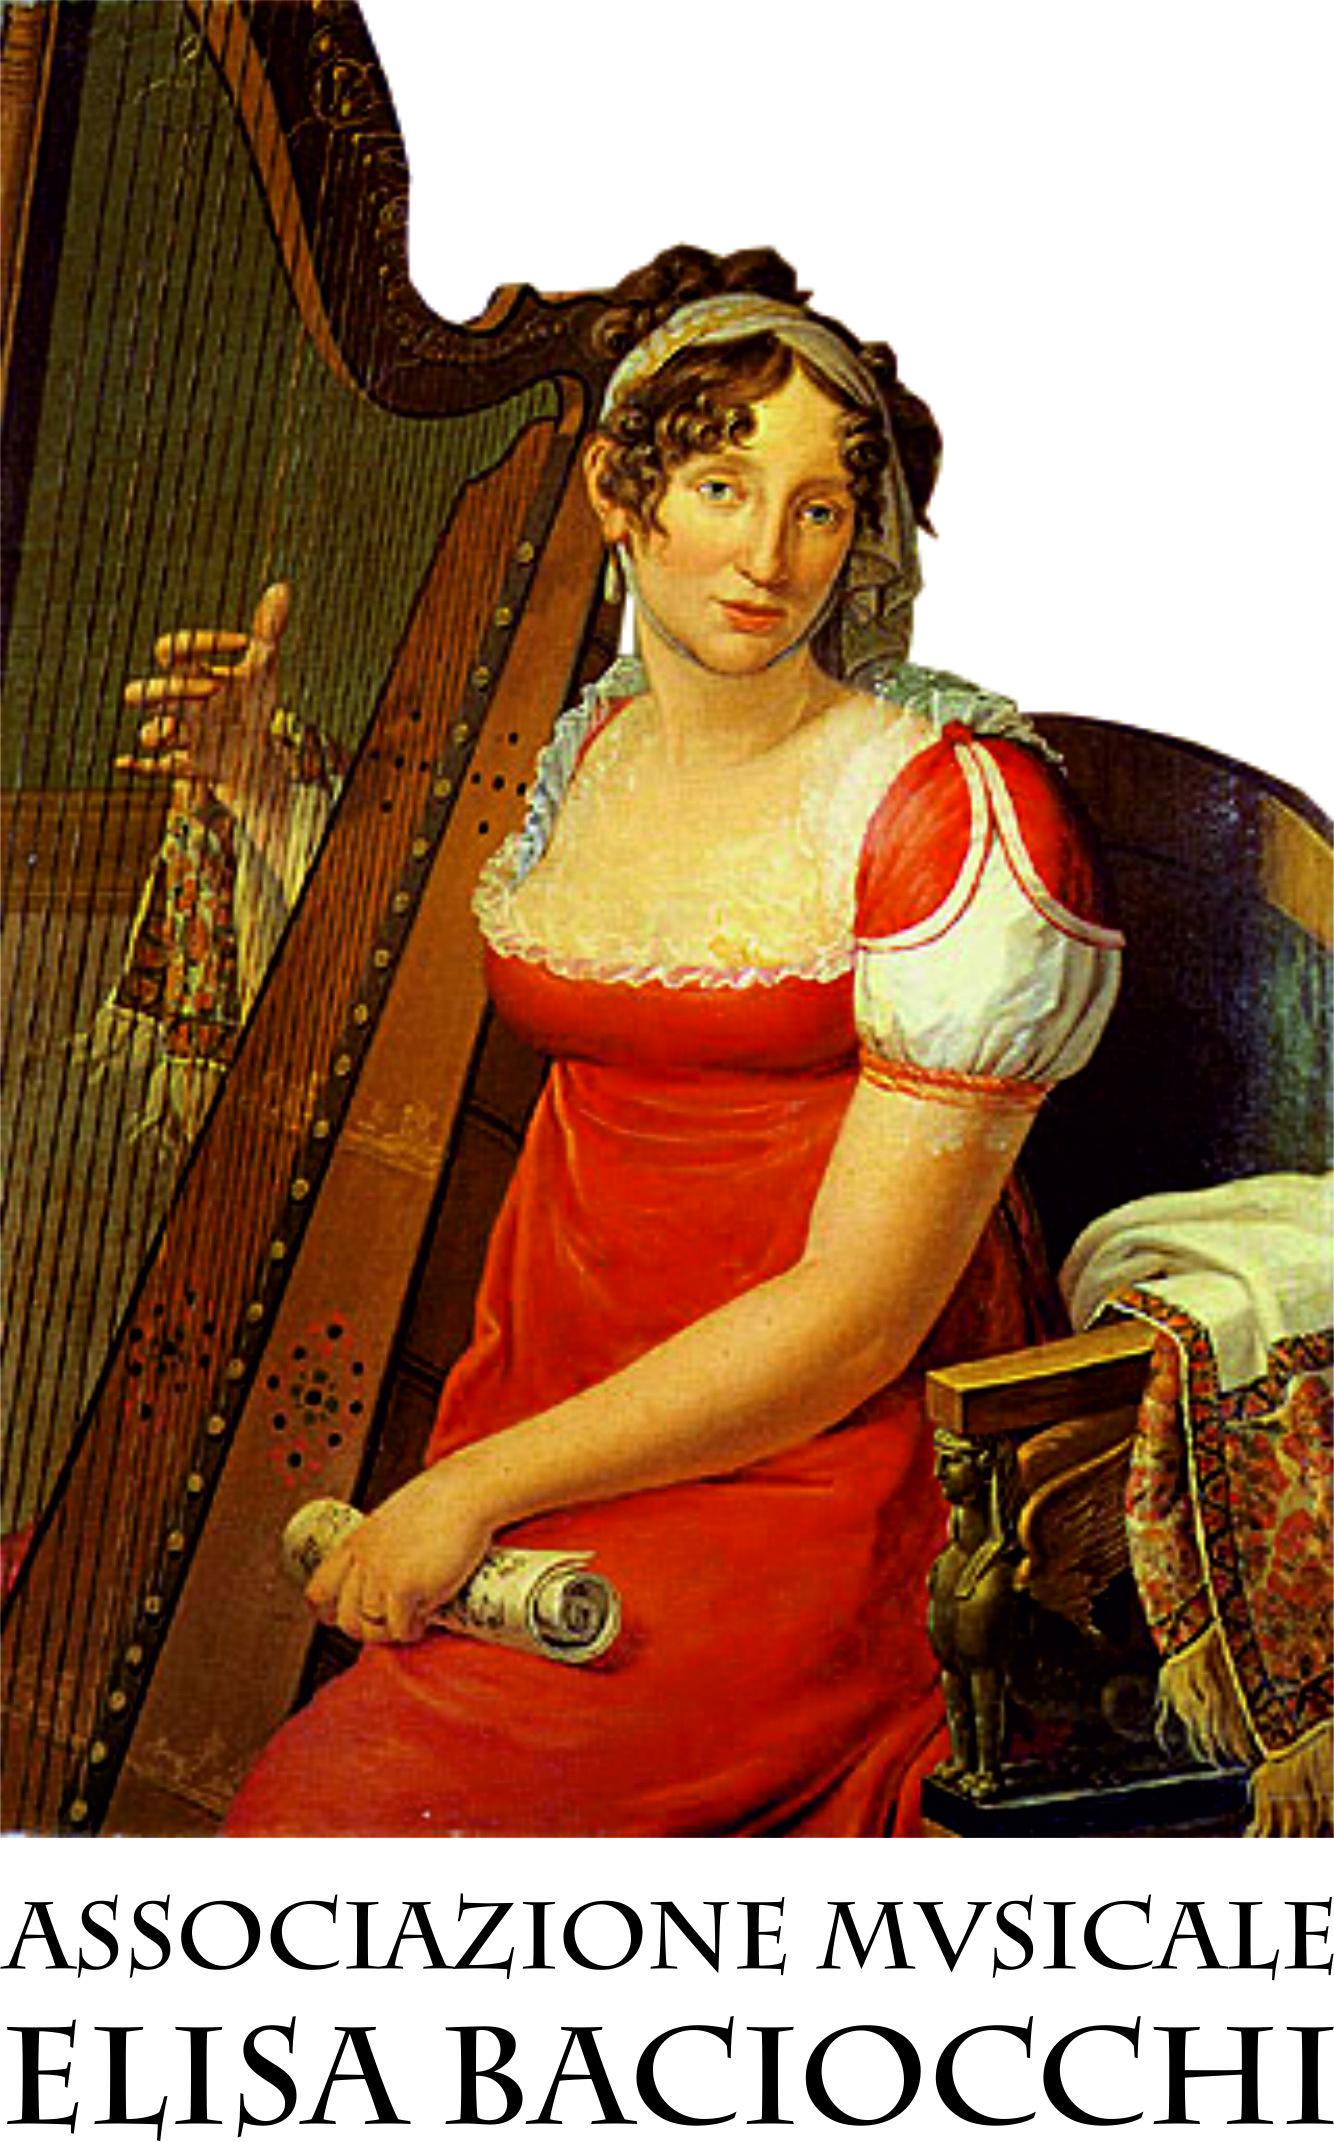 Associazione Musicale Elisa Baciocchi